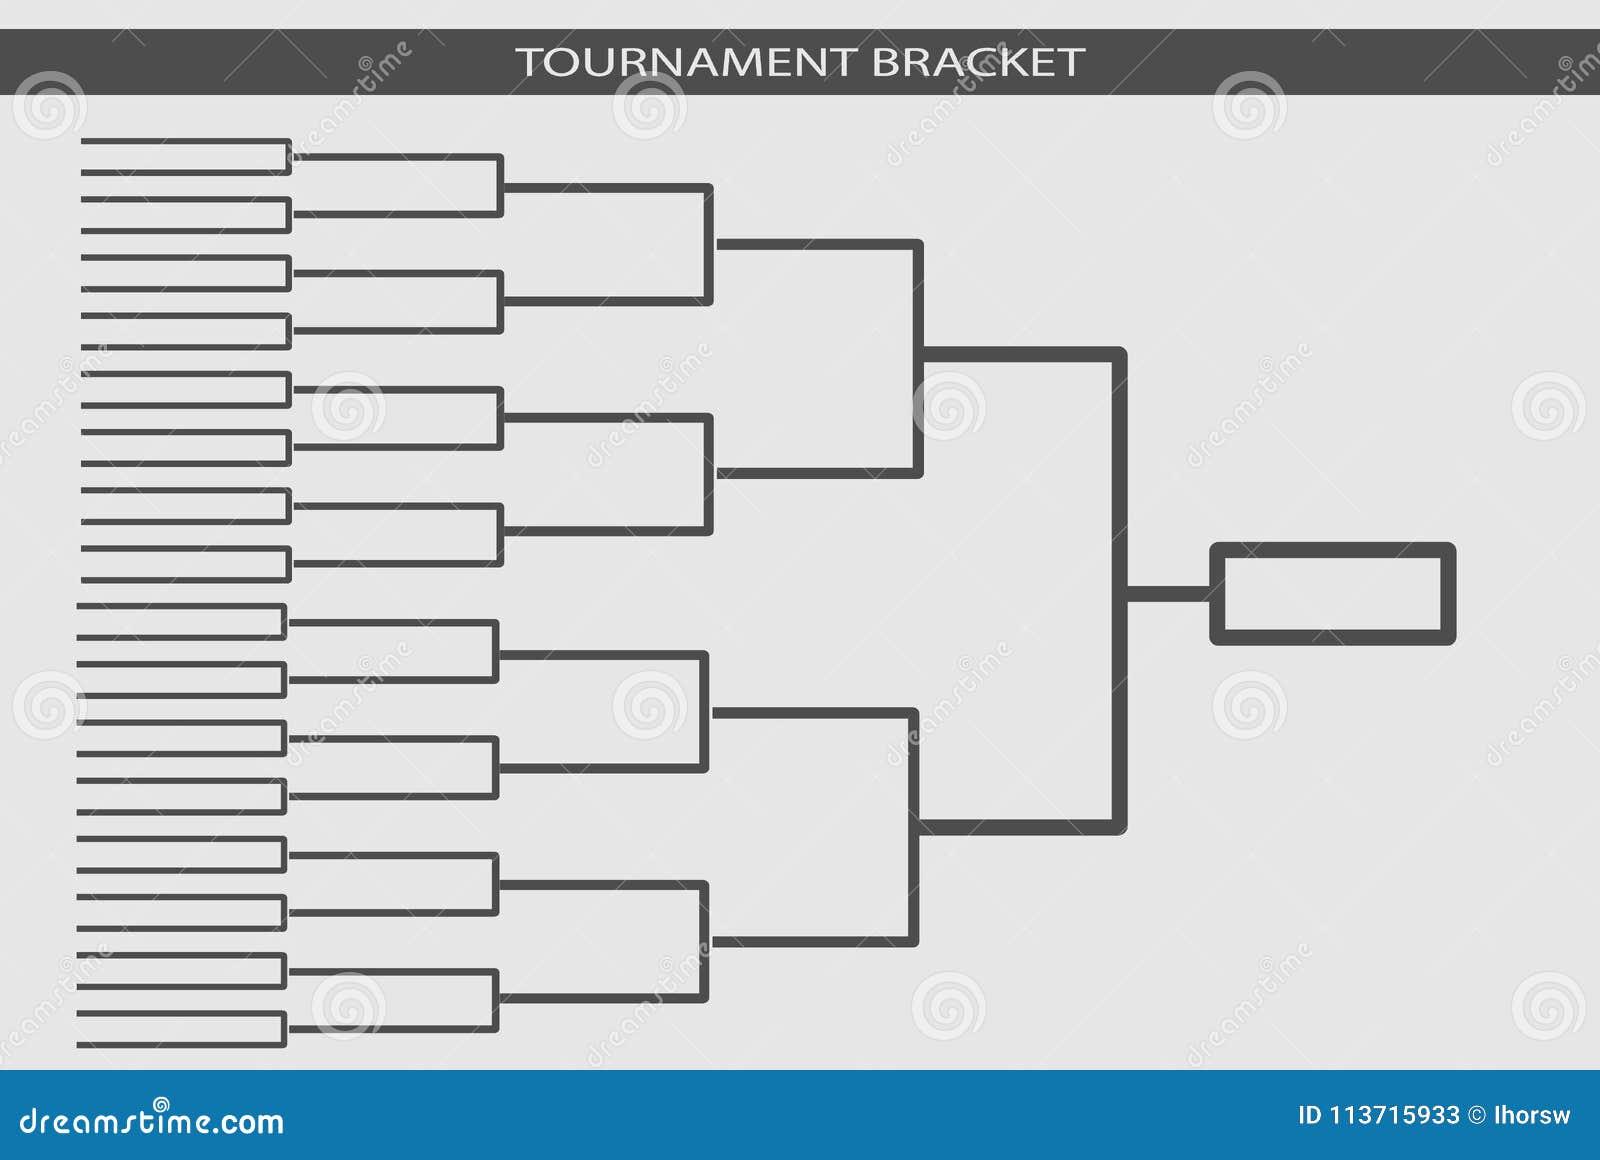 Tournament bracket vector championship template stock vector download tournament bracket vector championship template stock vector illustration of champion background maxwellsz